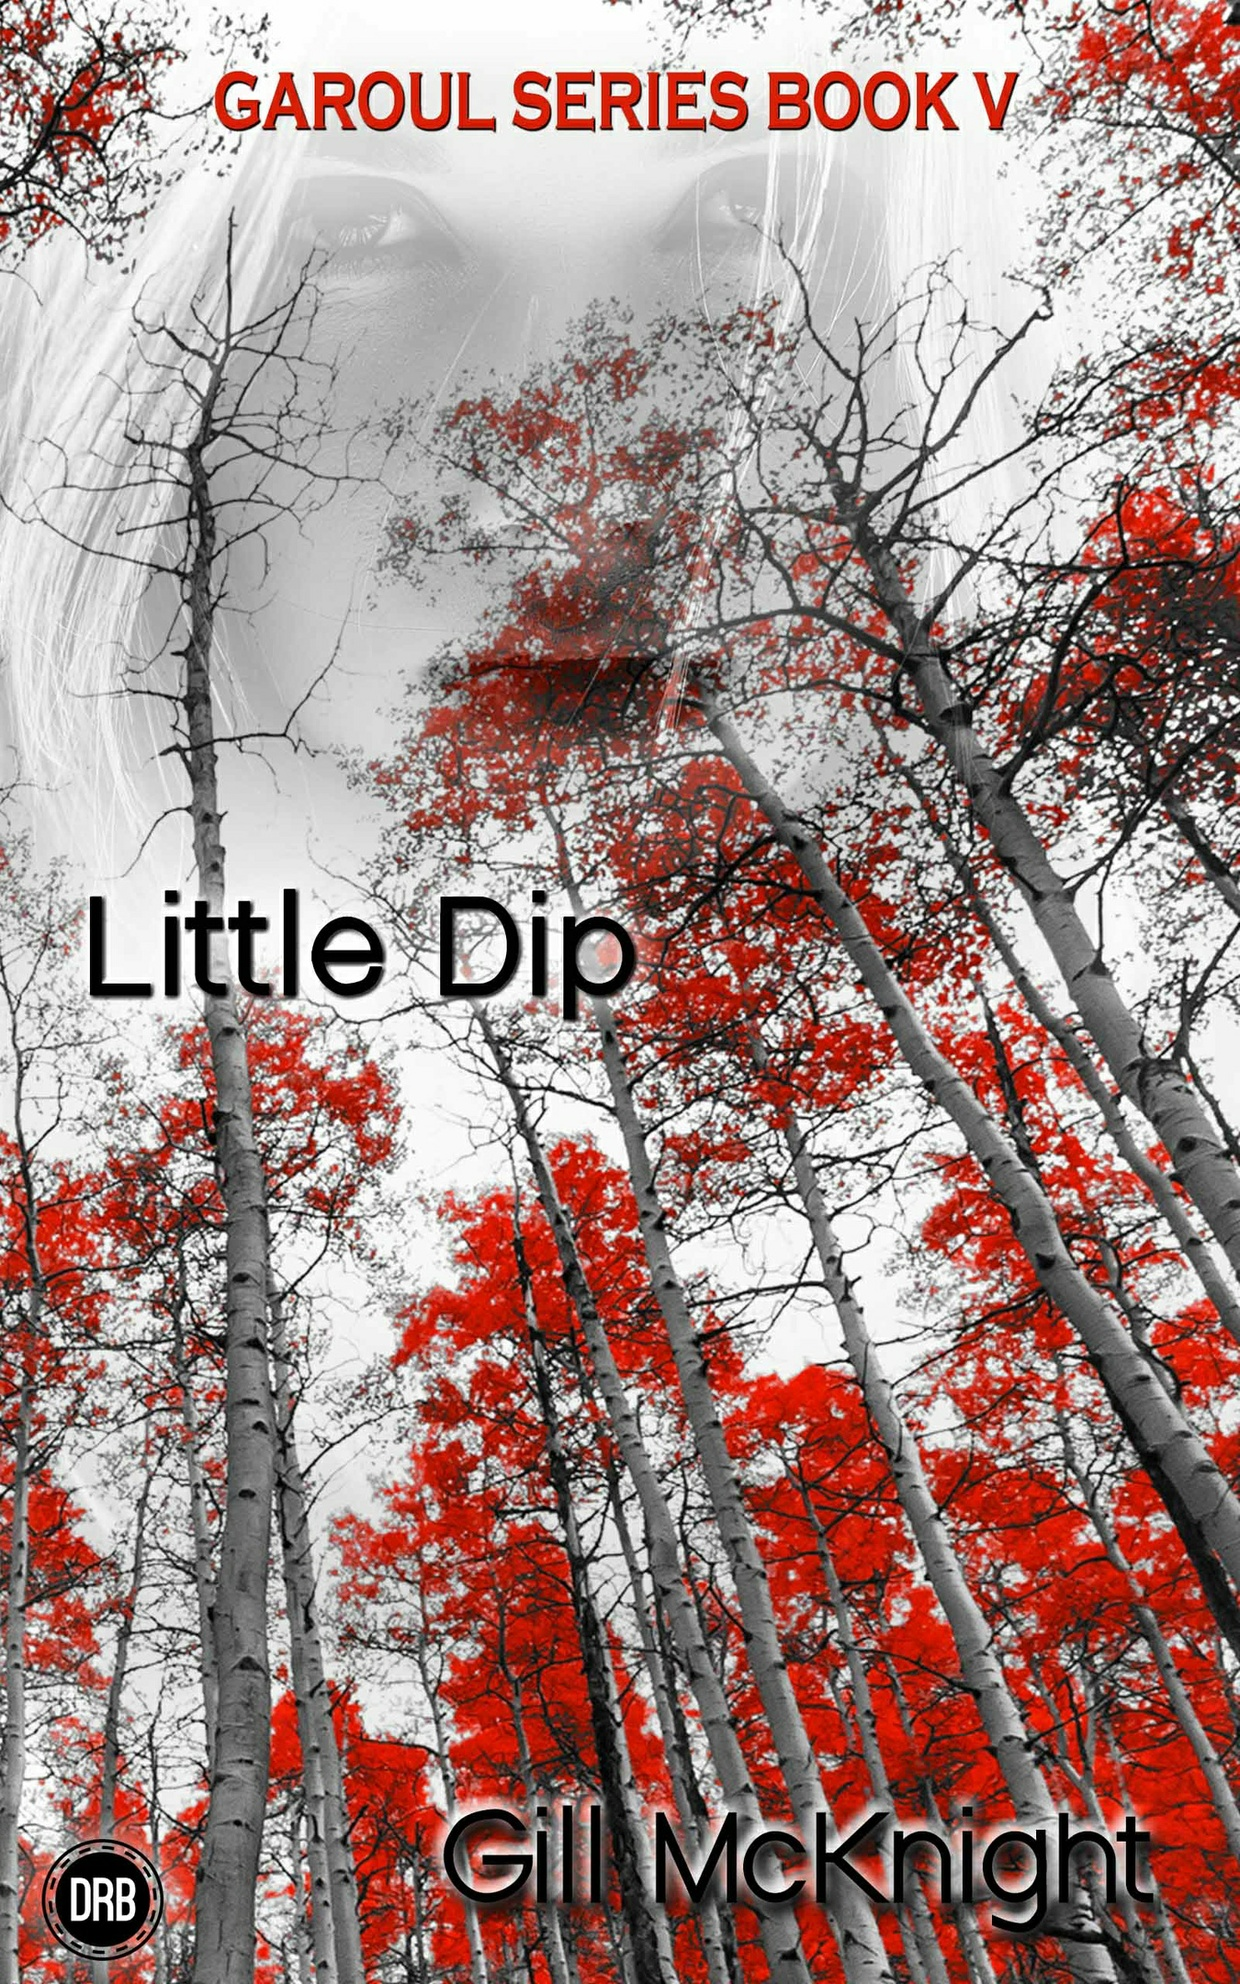 Little Dip by Gill McKnight - Garoul Series Book V (epub)